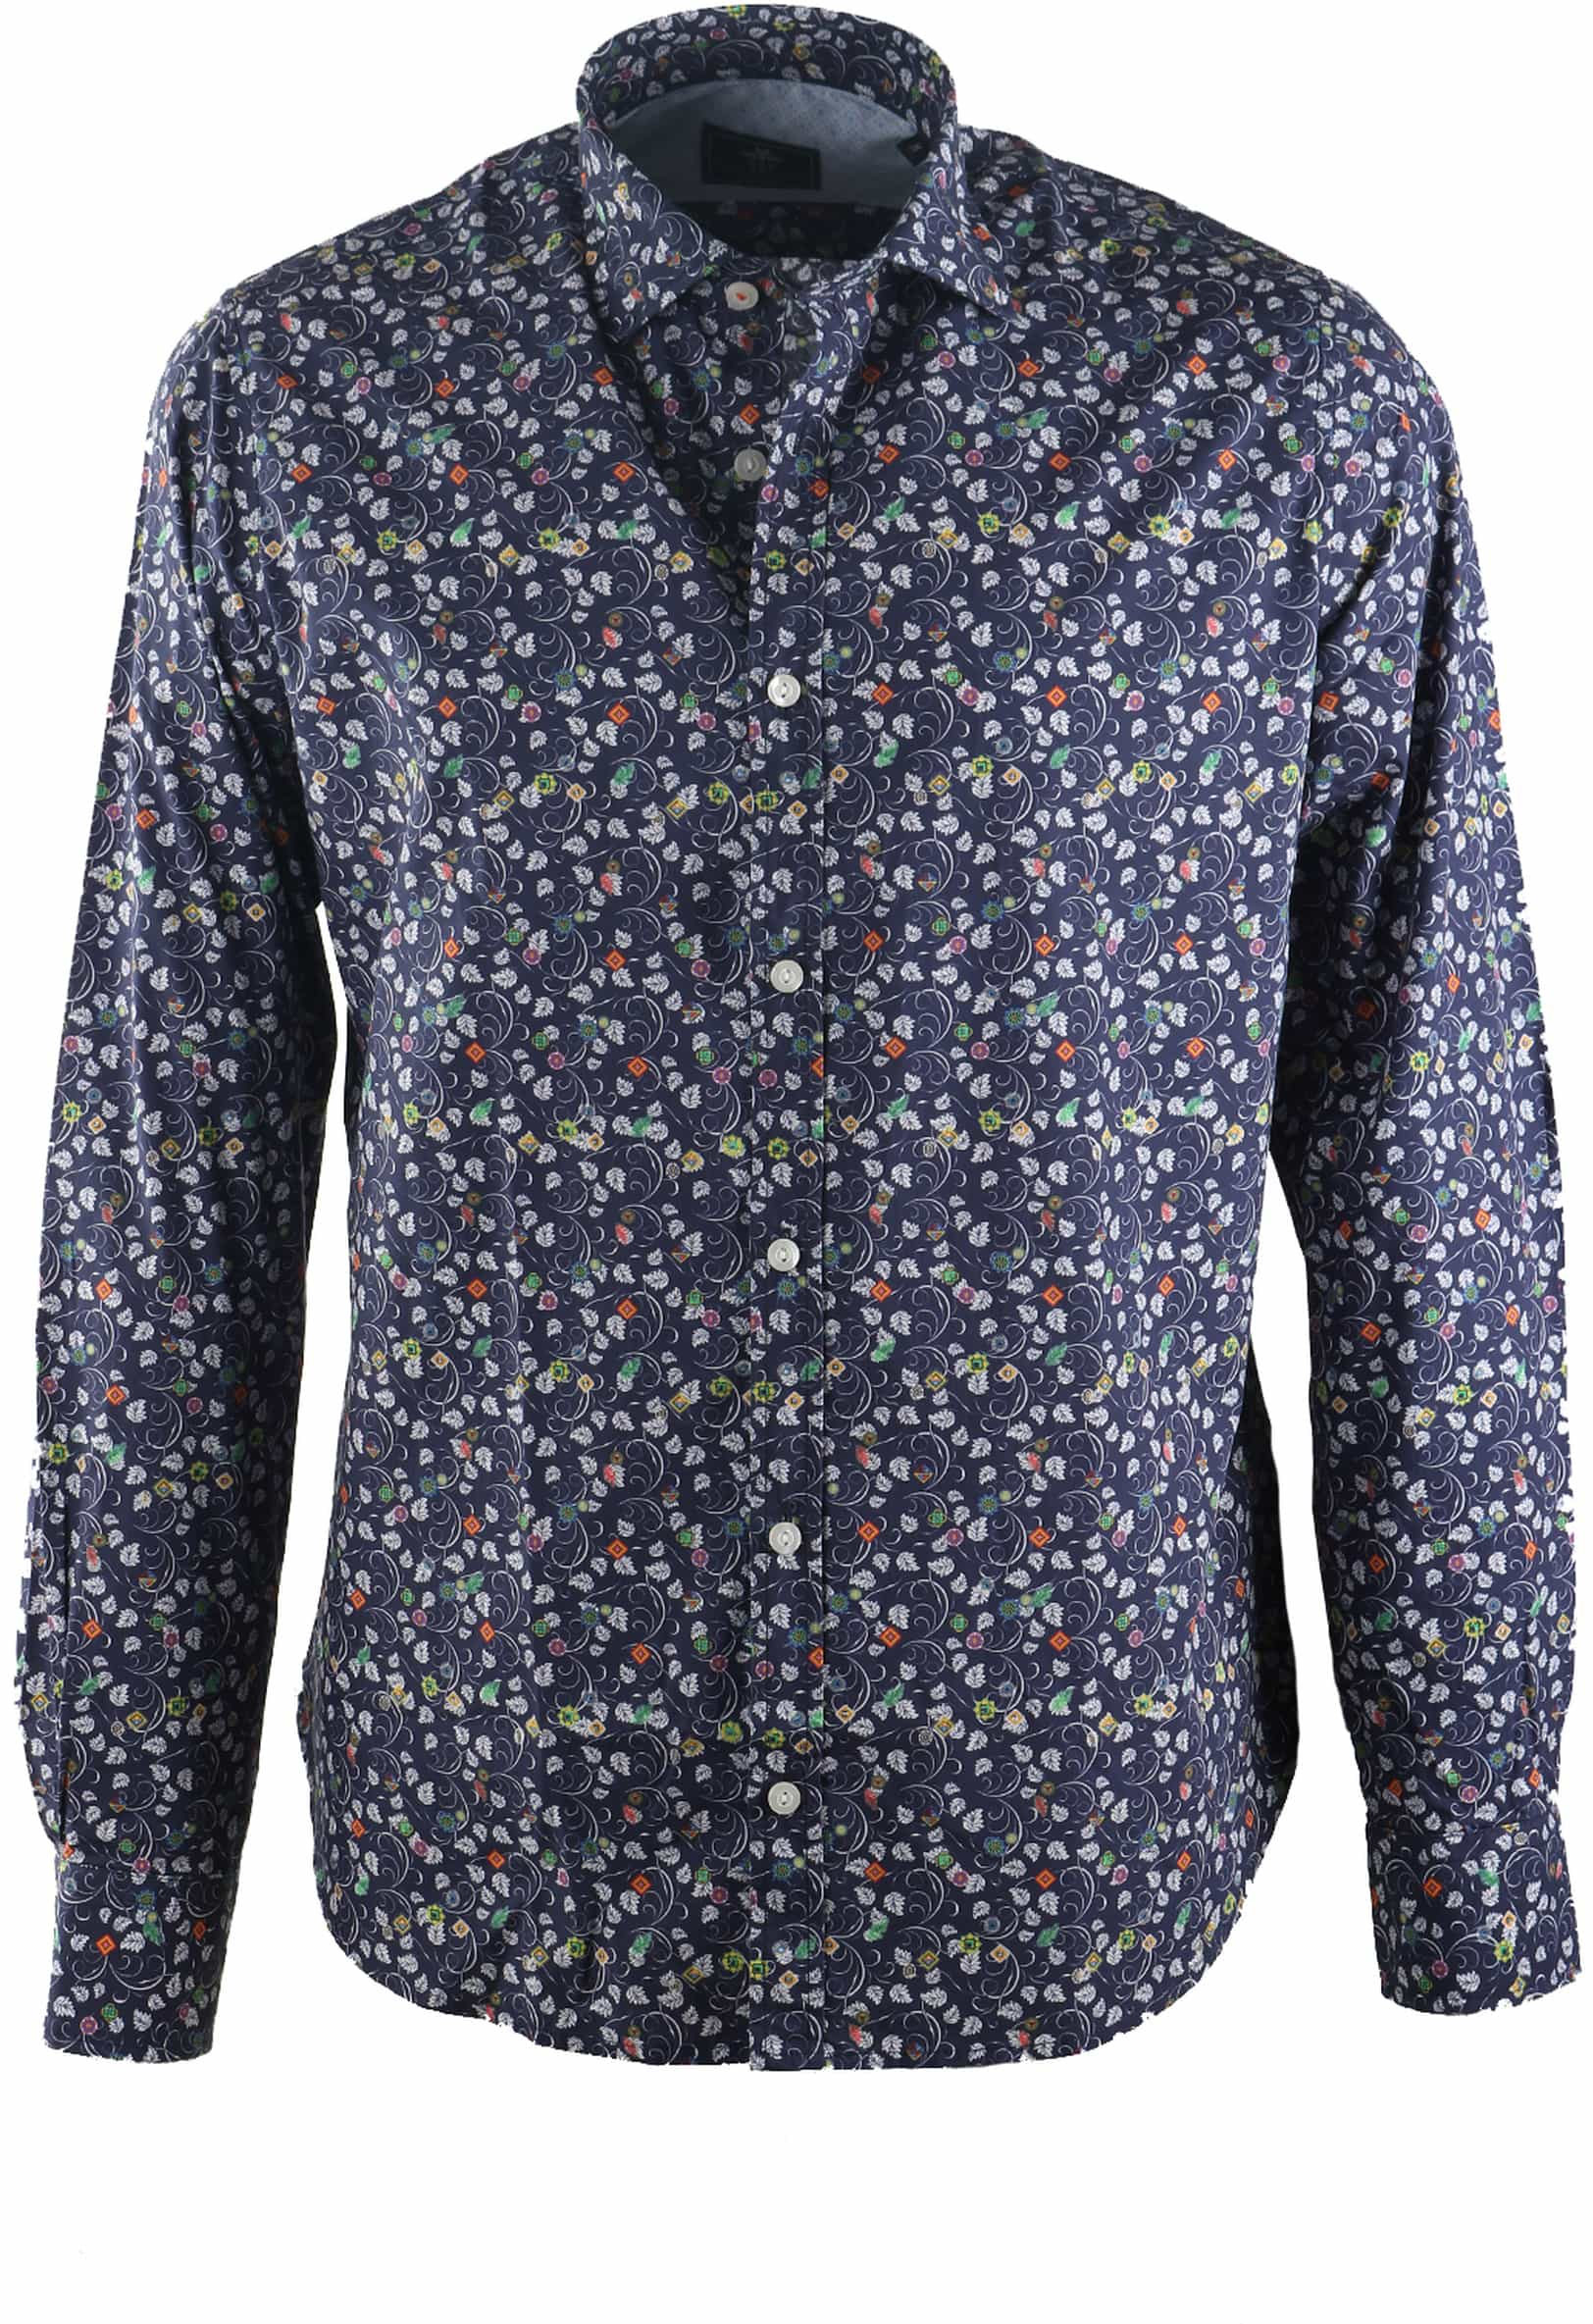 NZA Overhemd Donkerblauw 17AN509 foto 0